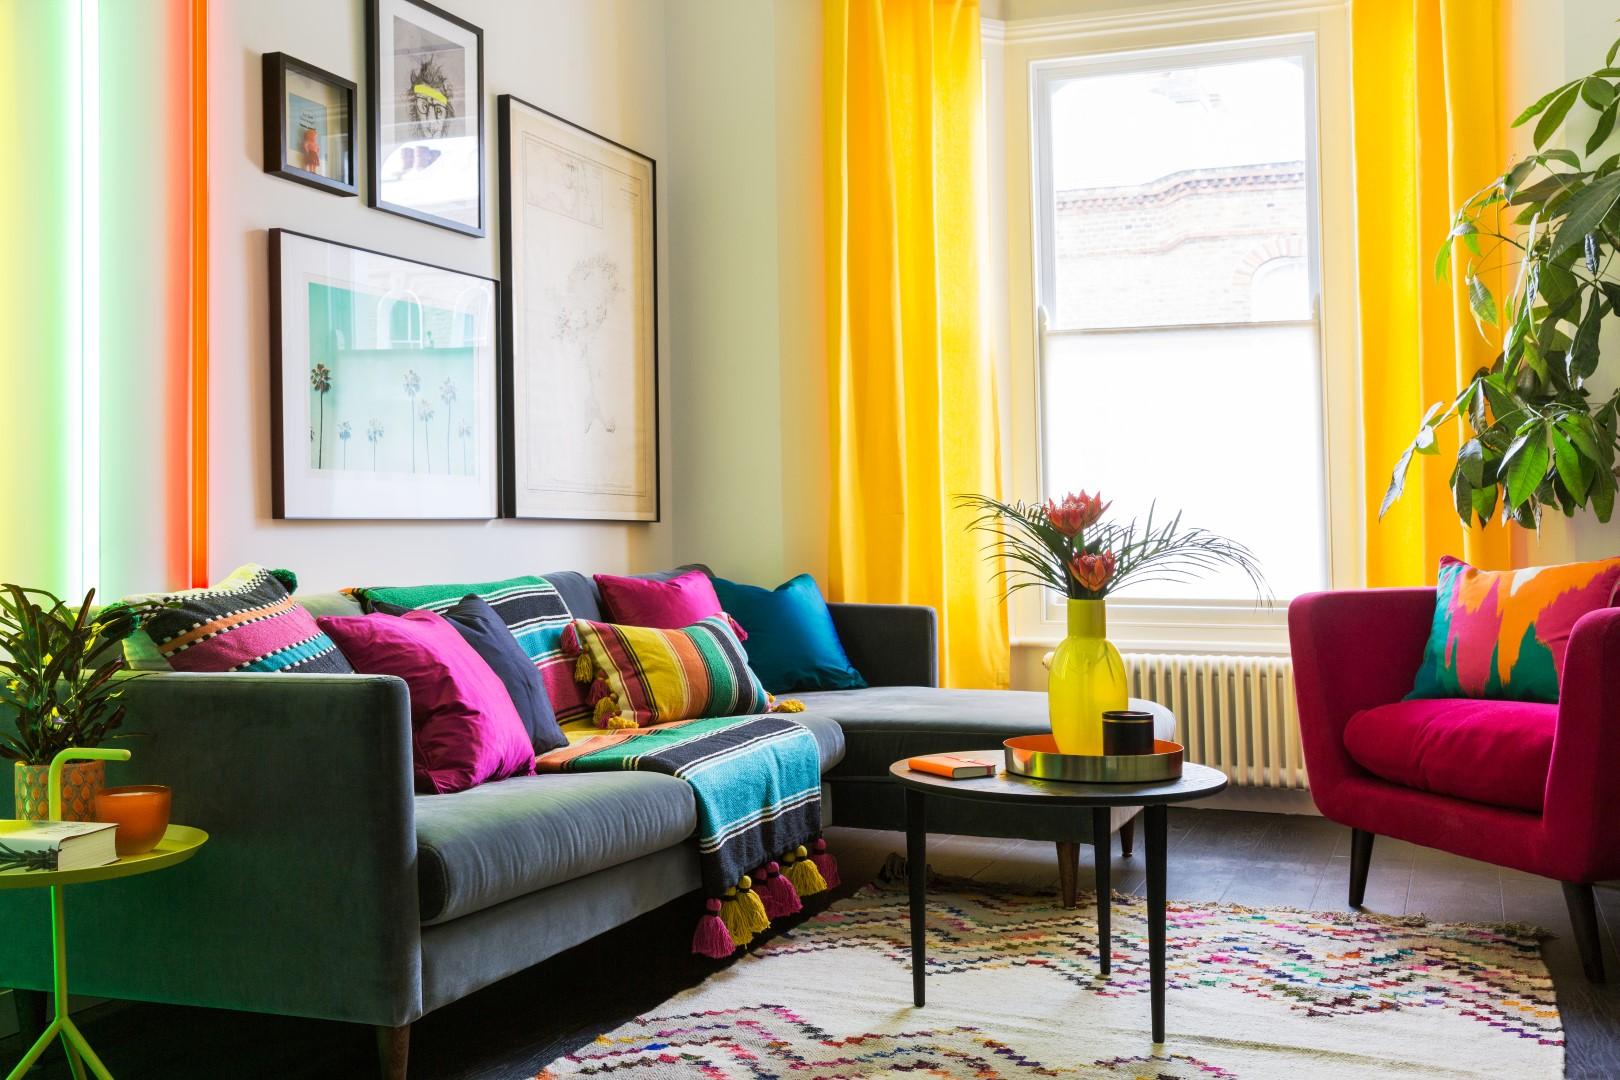 How To Decorate & Accessorise Dark Furniture | UK ... on Small:szwbf50Ltbw= Living Room Decor Ideas  id=48722